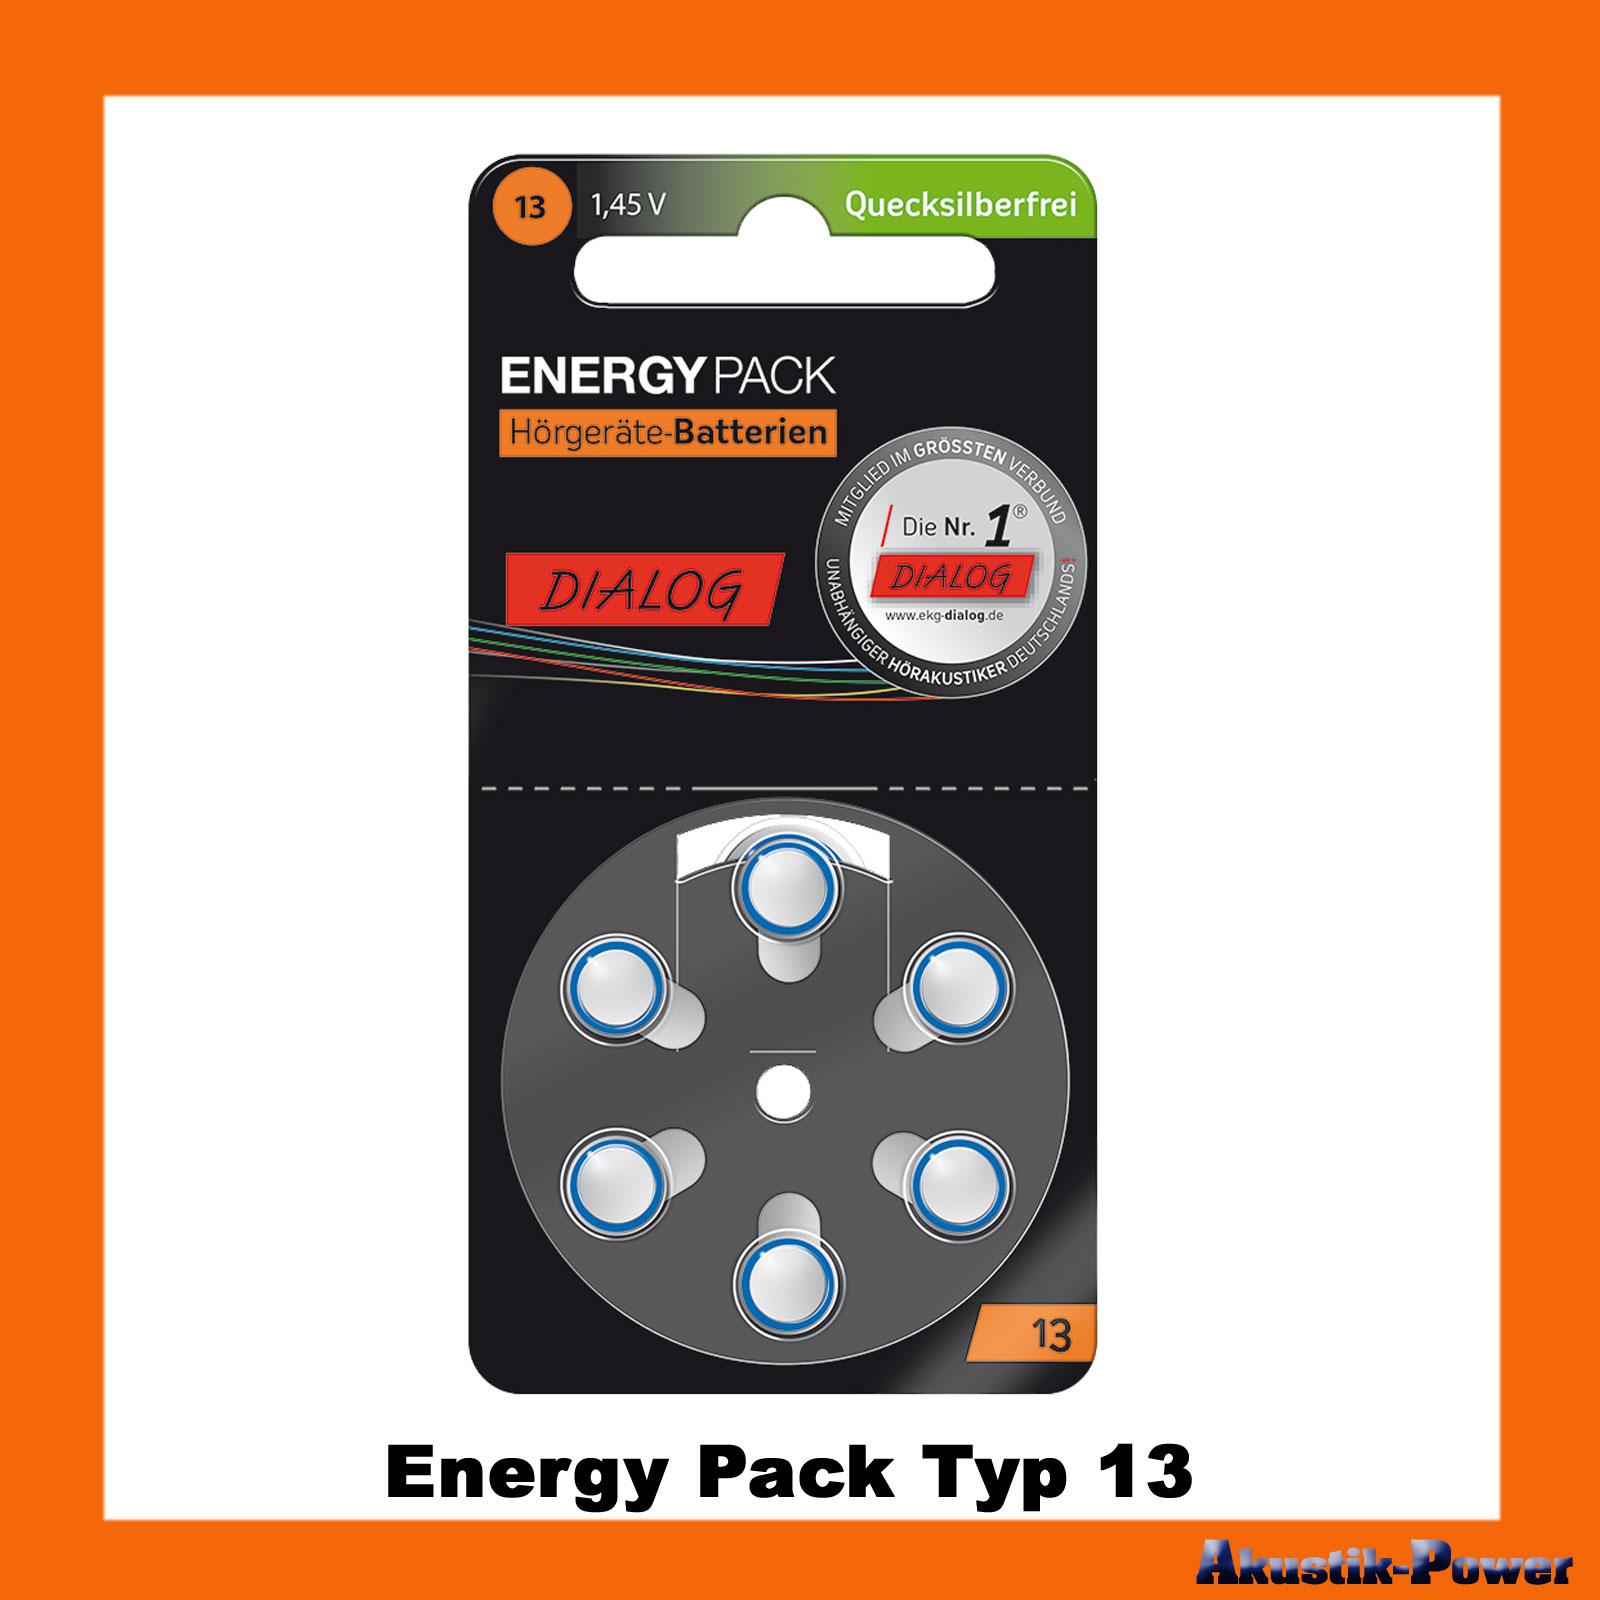 akustik power energy pack typ 13 pr48 a13 h rger te batterien online kaufen. Black Bedroom Furniture Sets. Home Design Ideas